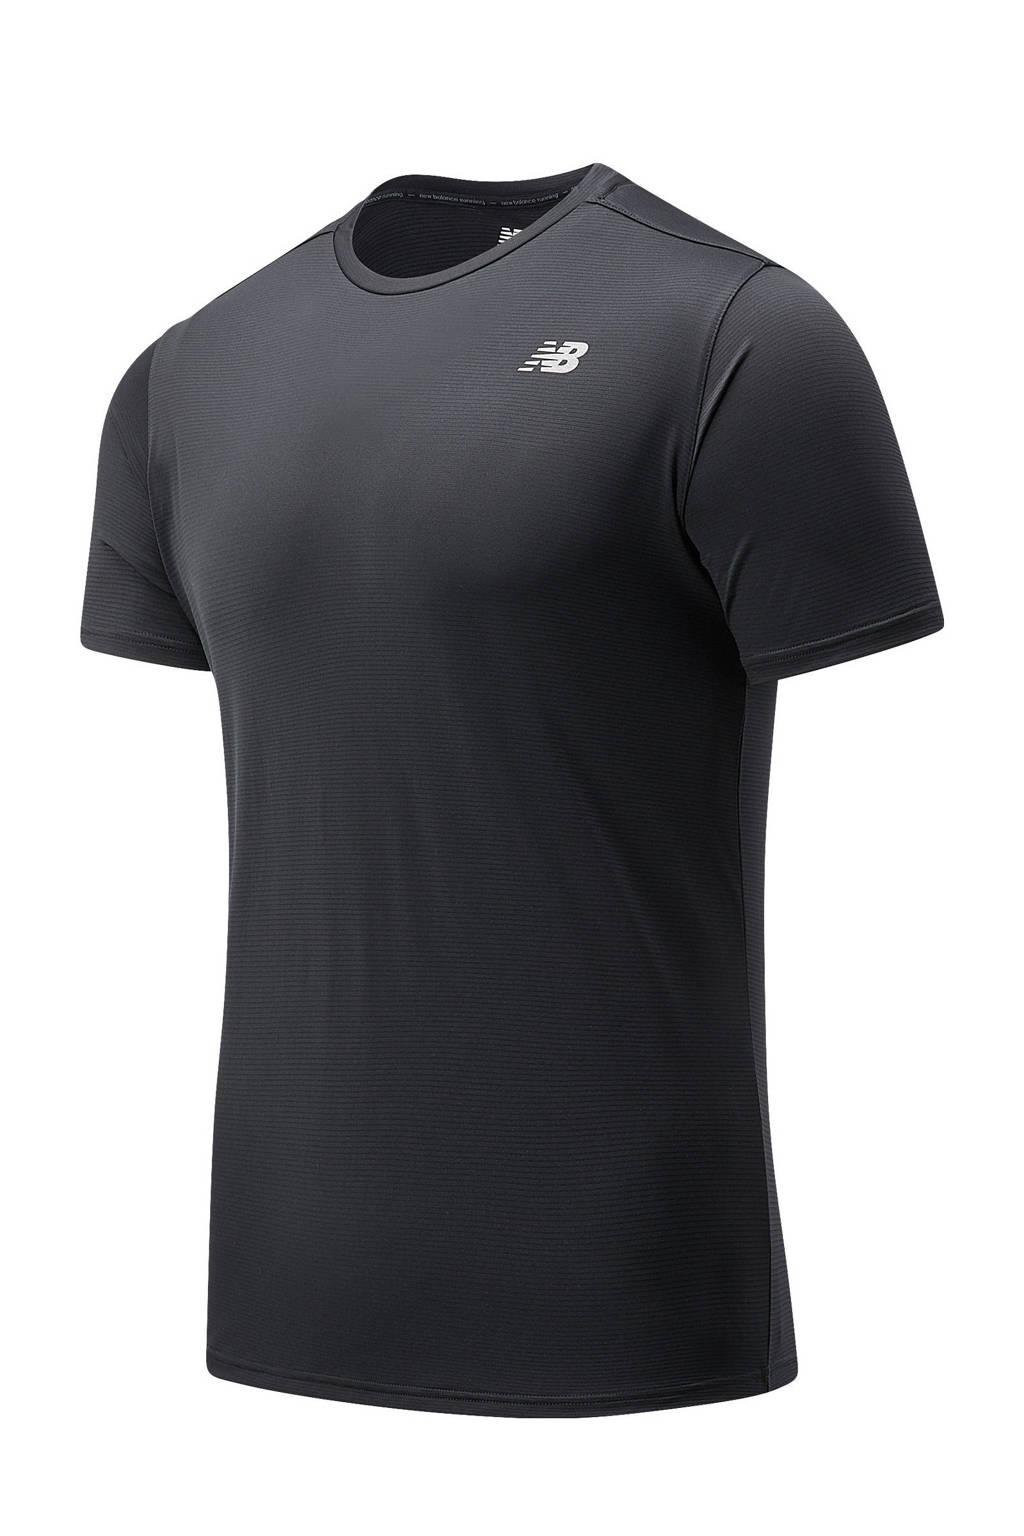 New Balance   hardloopshirt Accelerate zwart, Zwart